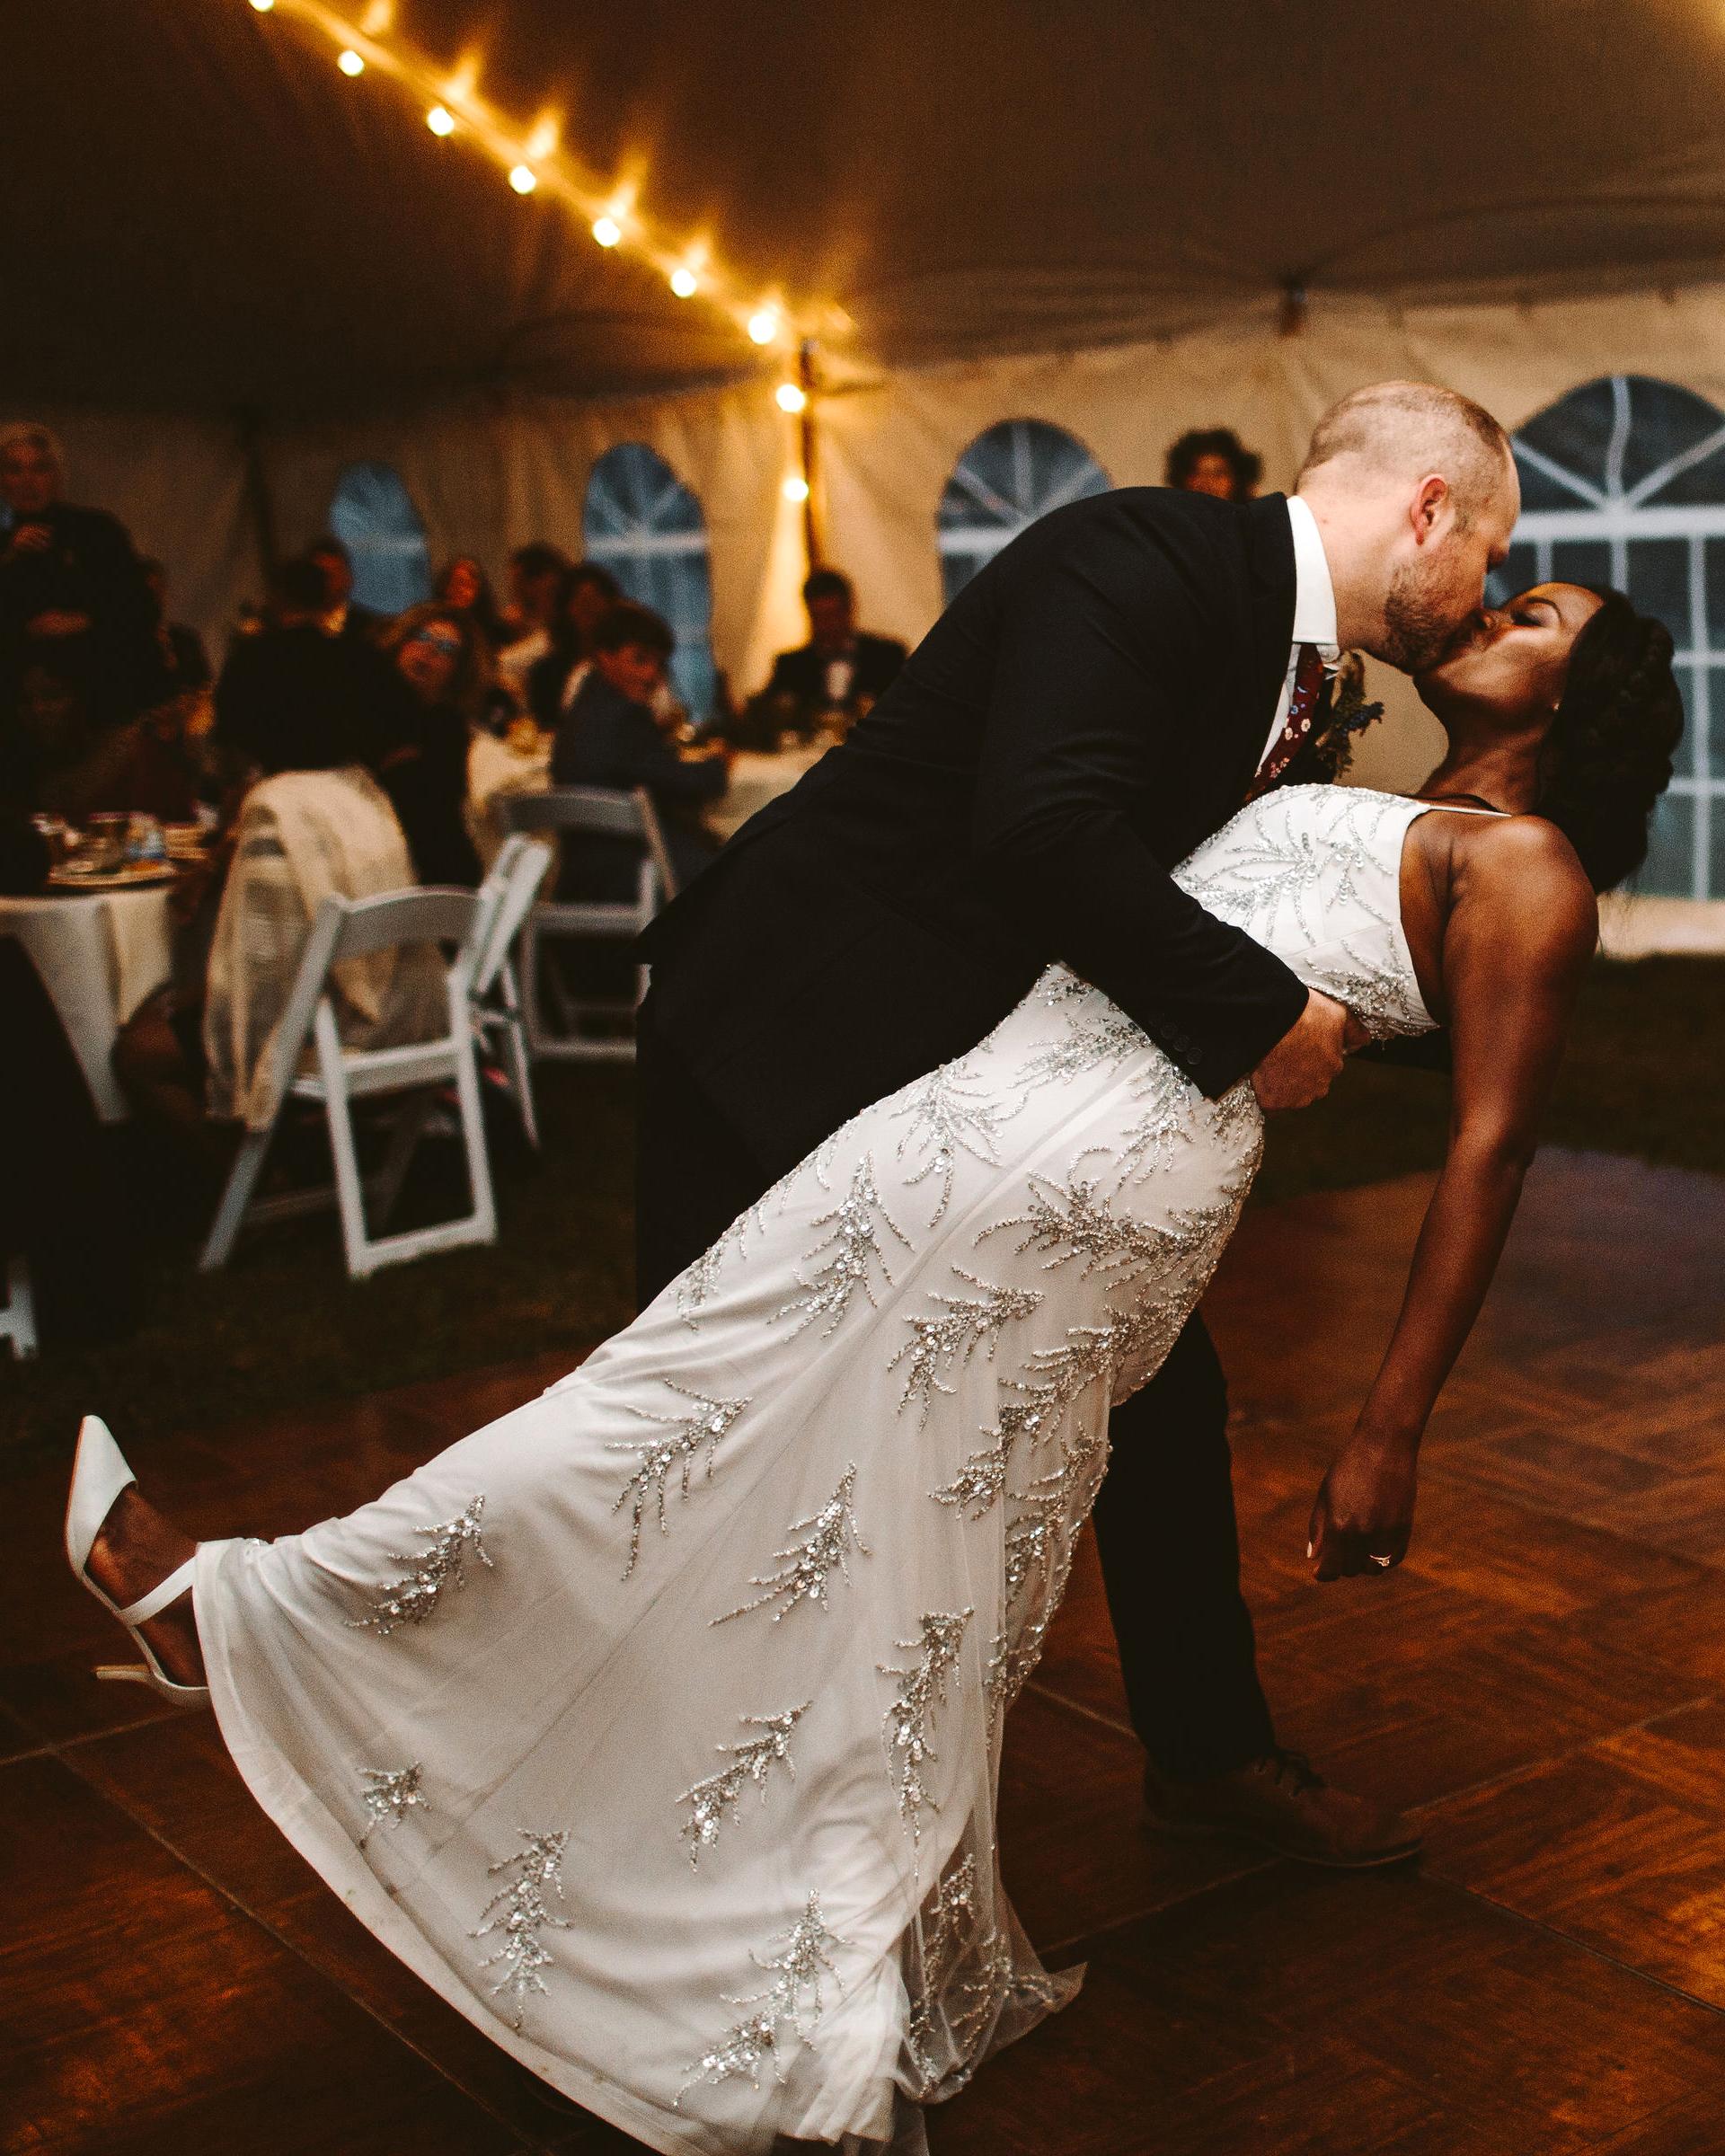 rivka aaron wedding couple first dance dip and kiss